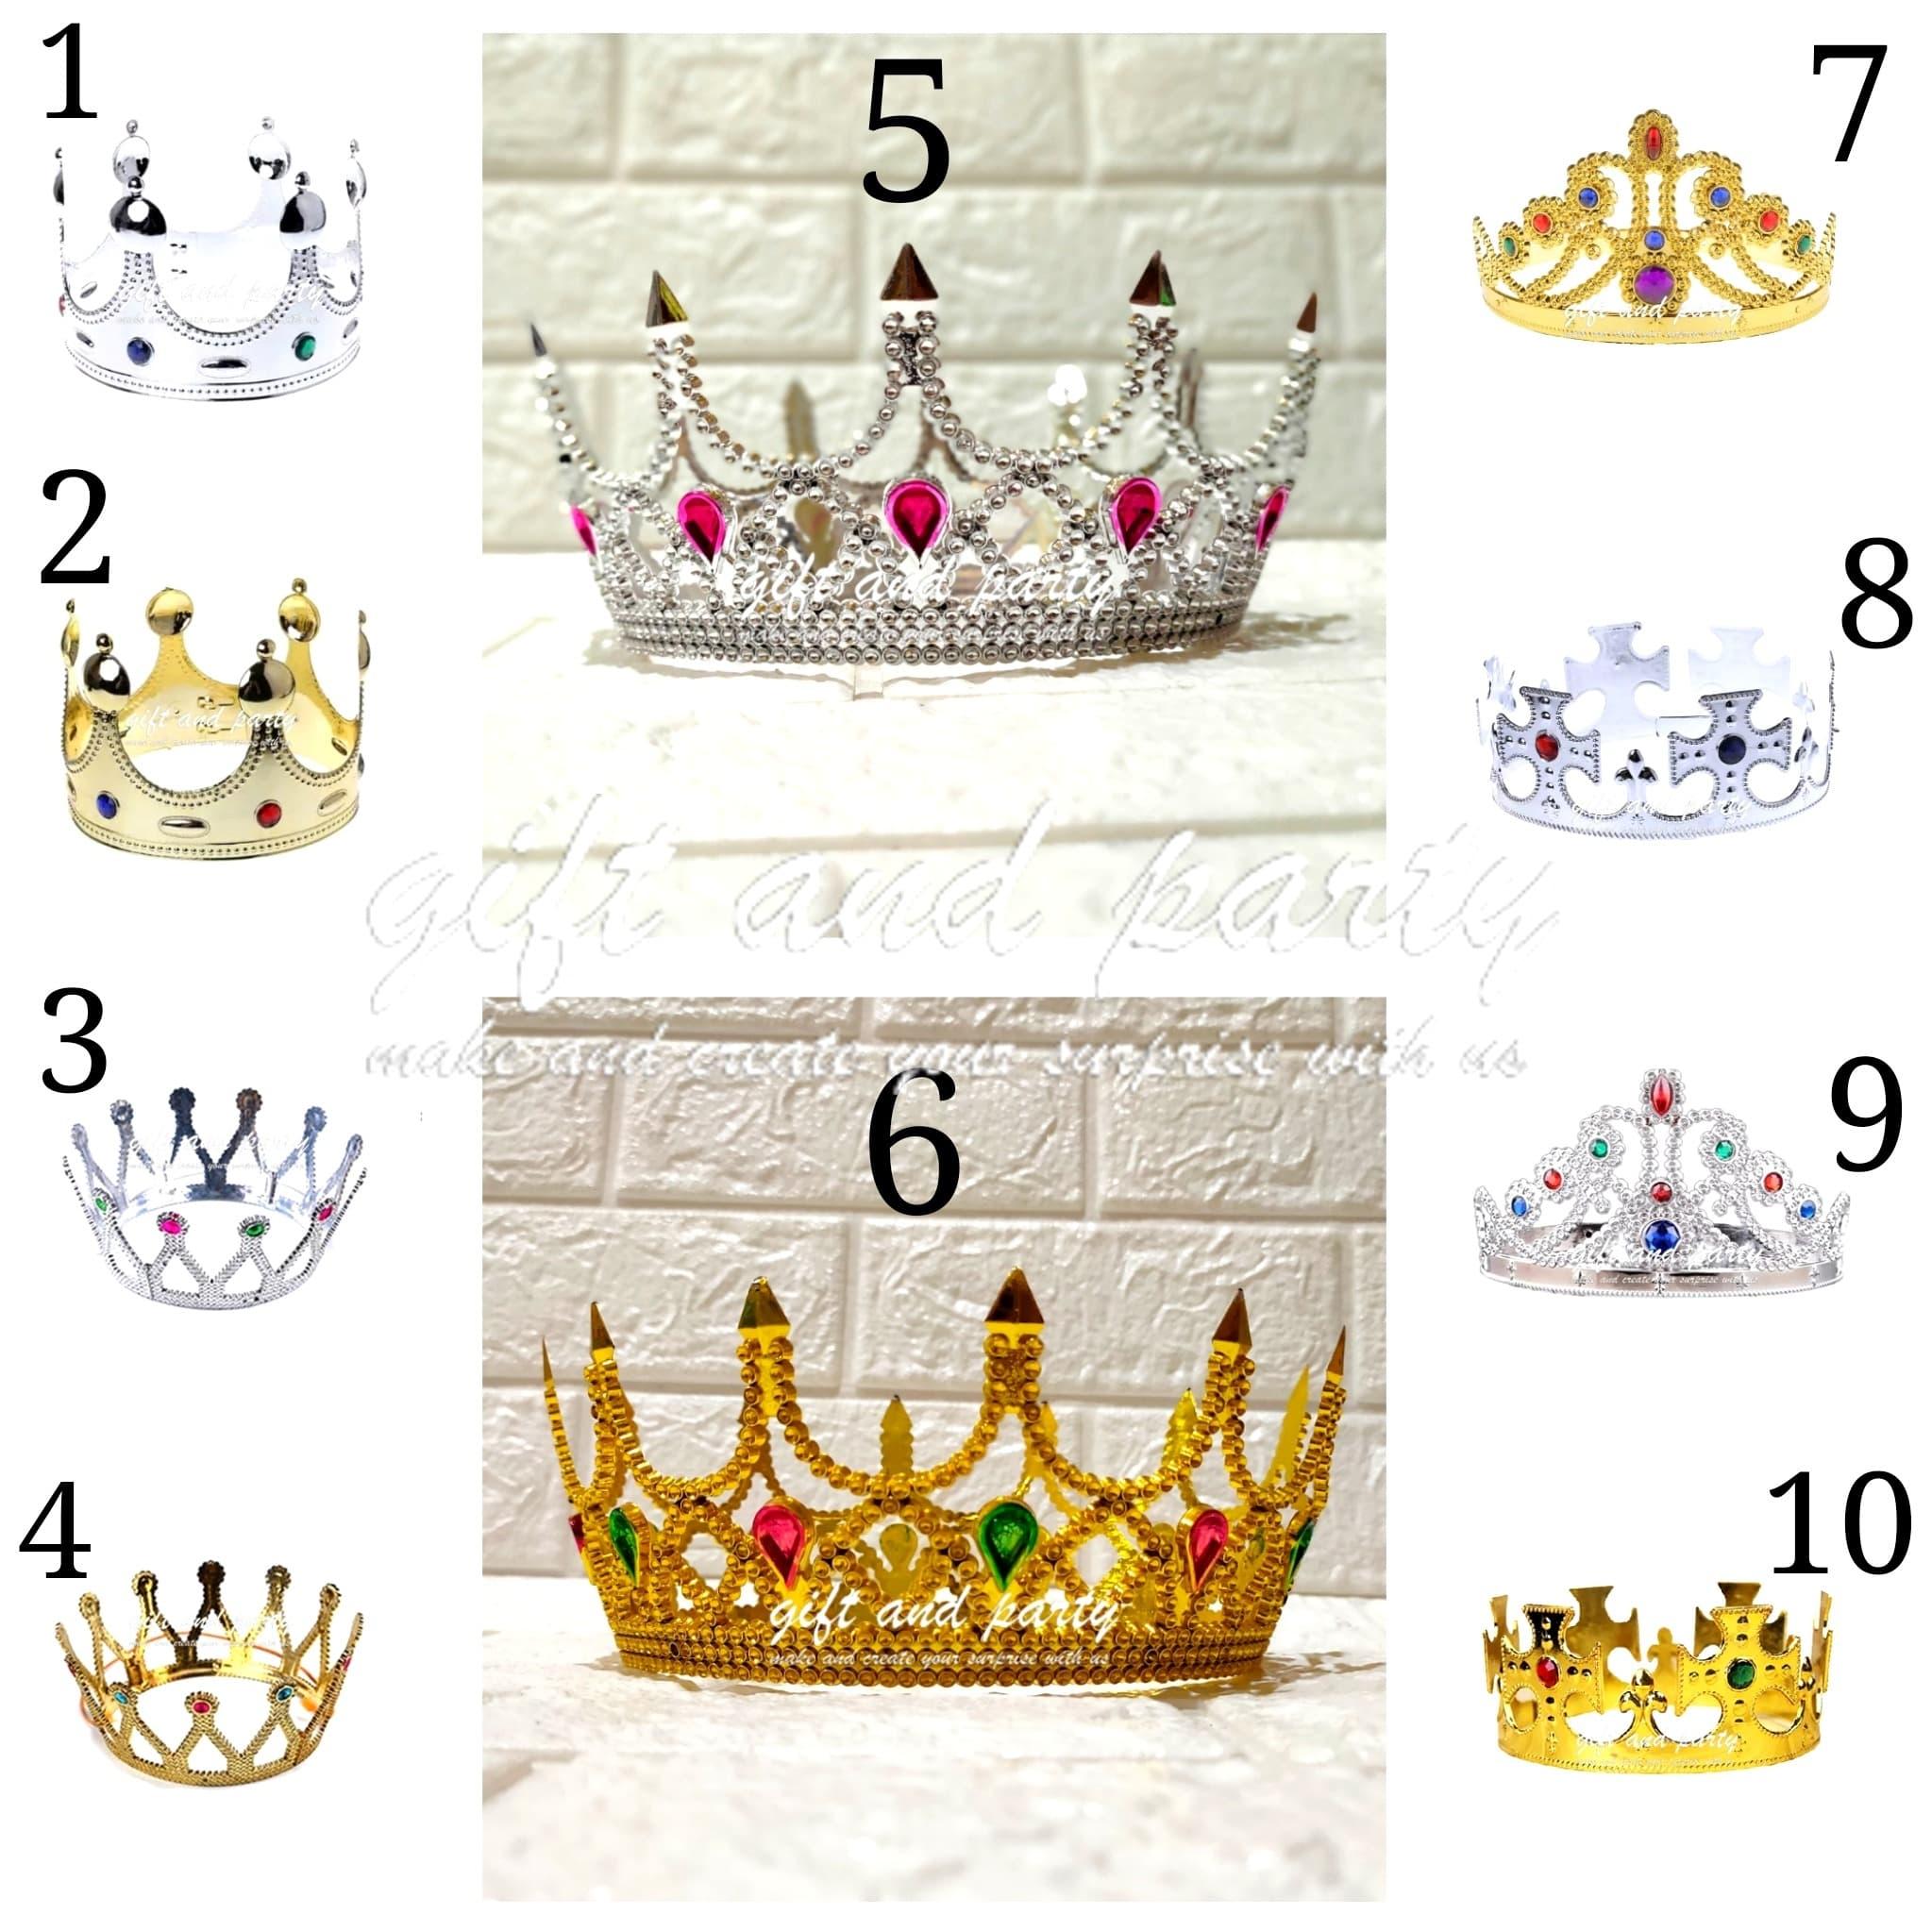 Mahkota Pesta Crown Party Headpiece Crown King Queen Crown thumbnail